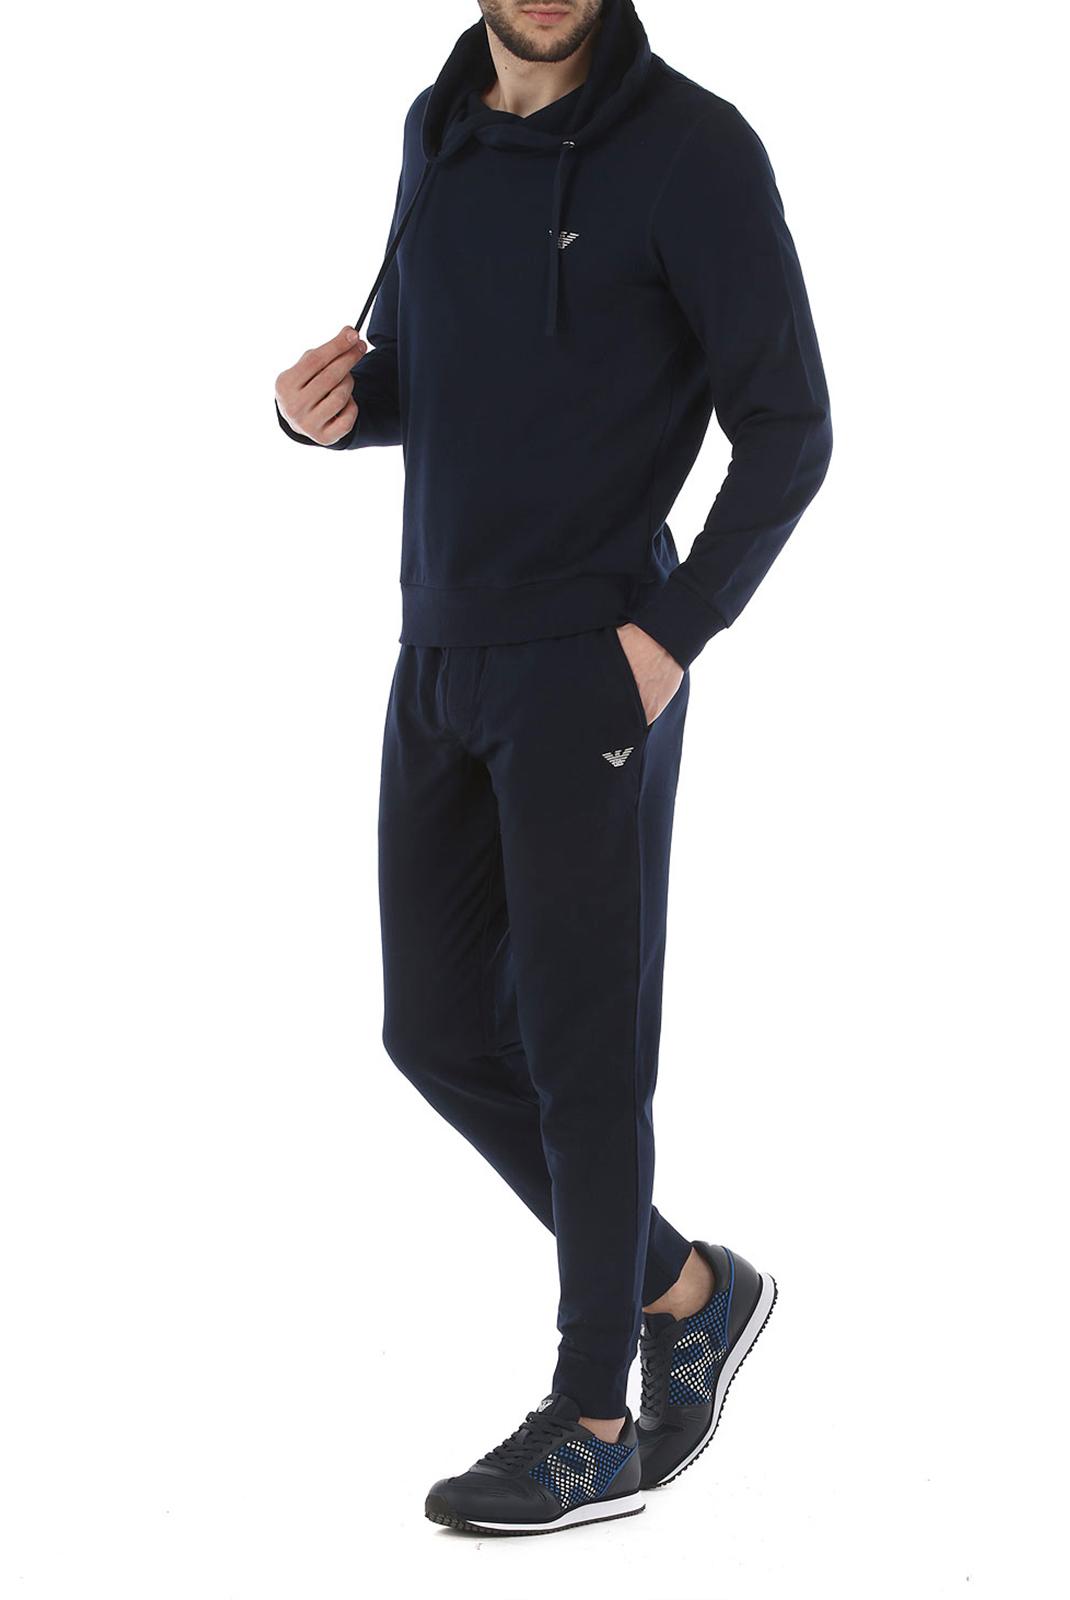 Pantalons sport/streetwear  Emporio armani 111690 7P571 00135 BLUE